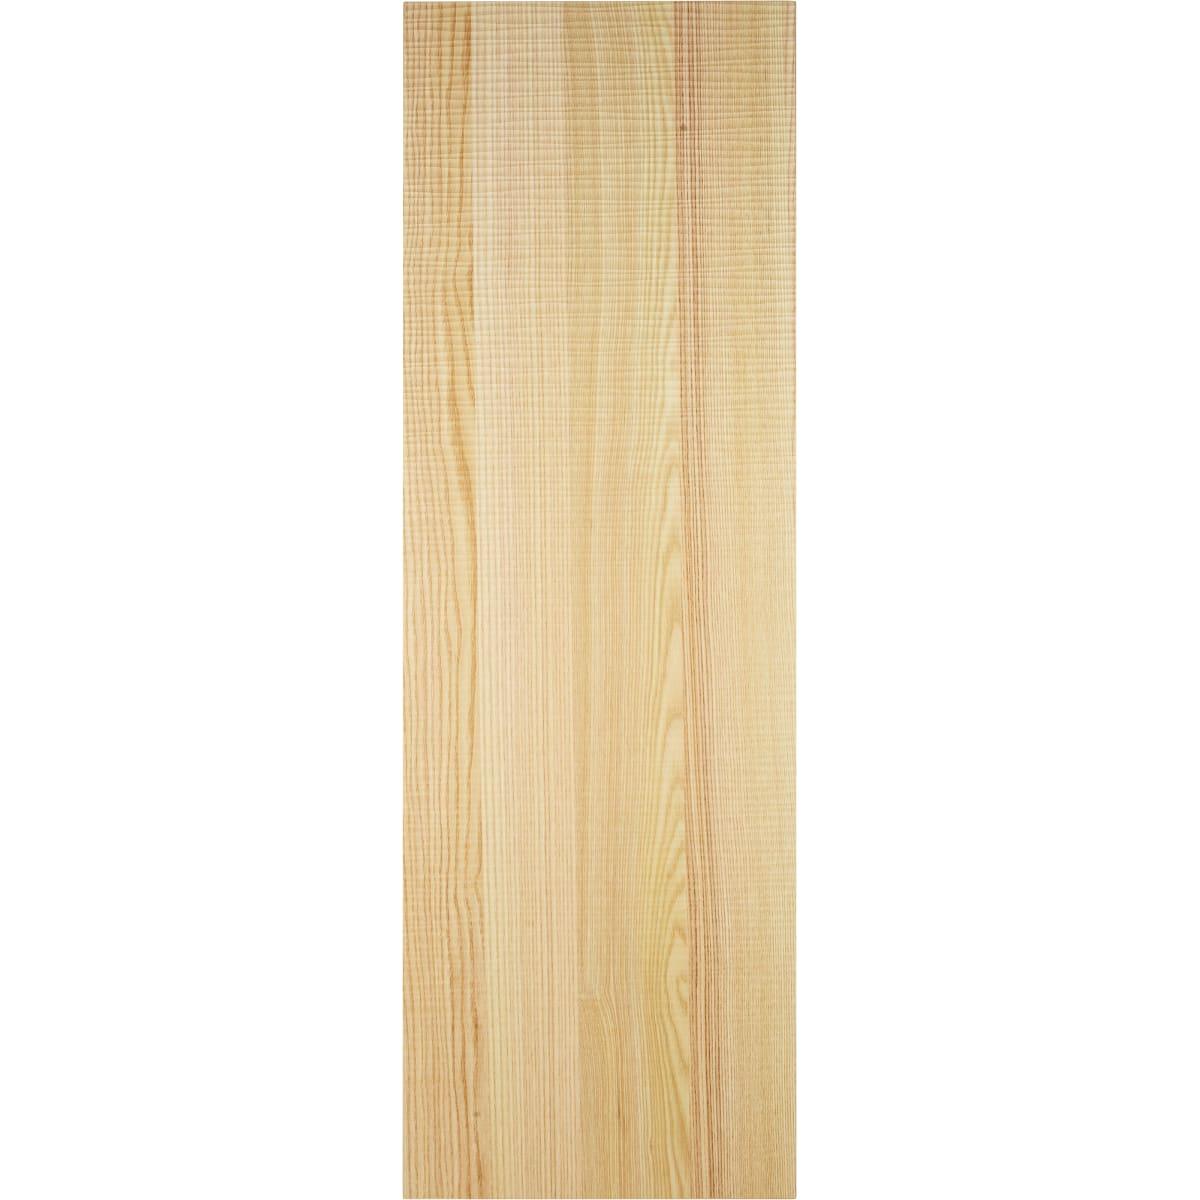 Дверь для шкафа Delinia «Браш» 30x92 см, ЛДСП, цвет бежевый